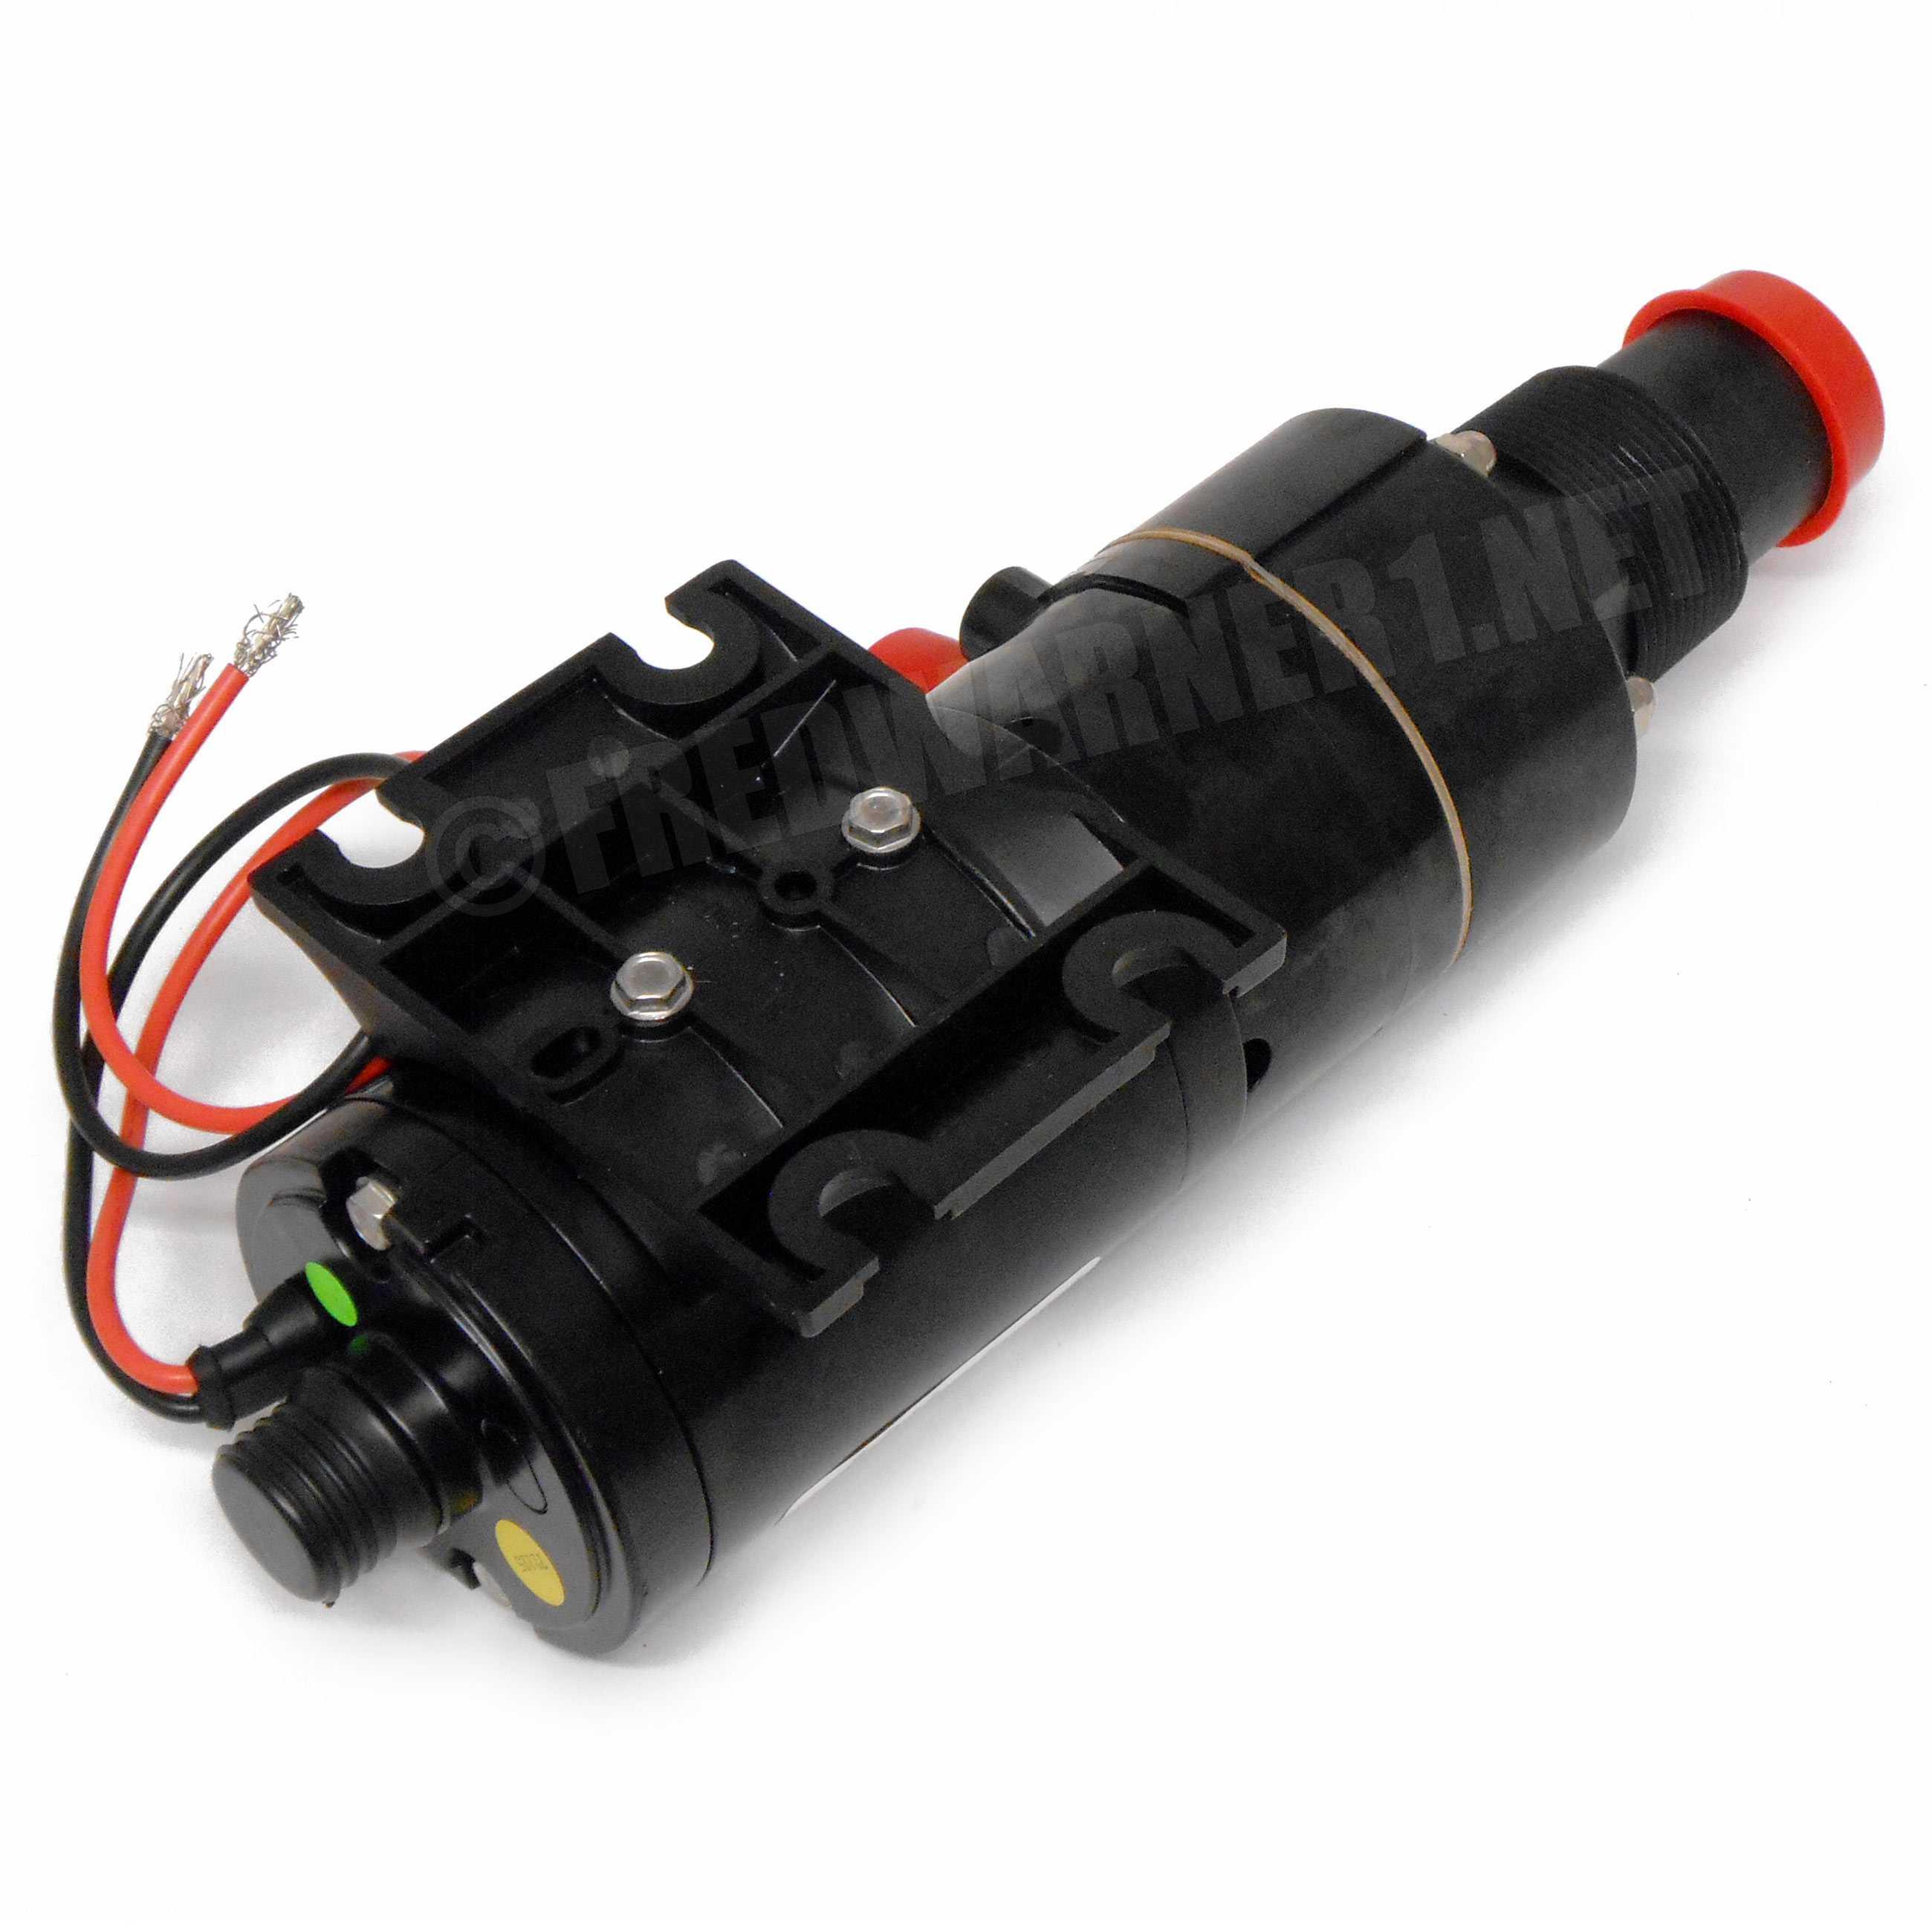 Jabsco 18590-2092 Macerator Waste Pump 12V DC Marine Self ...